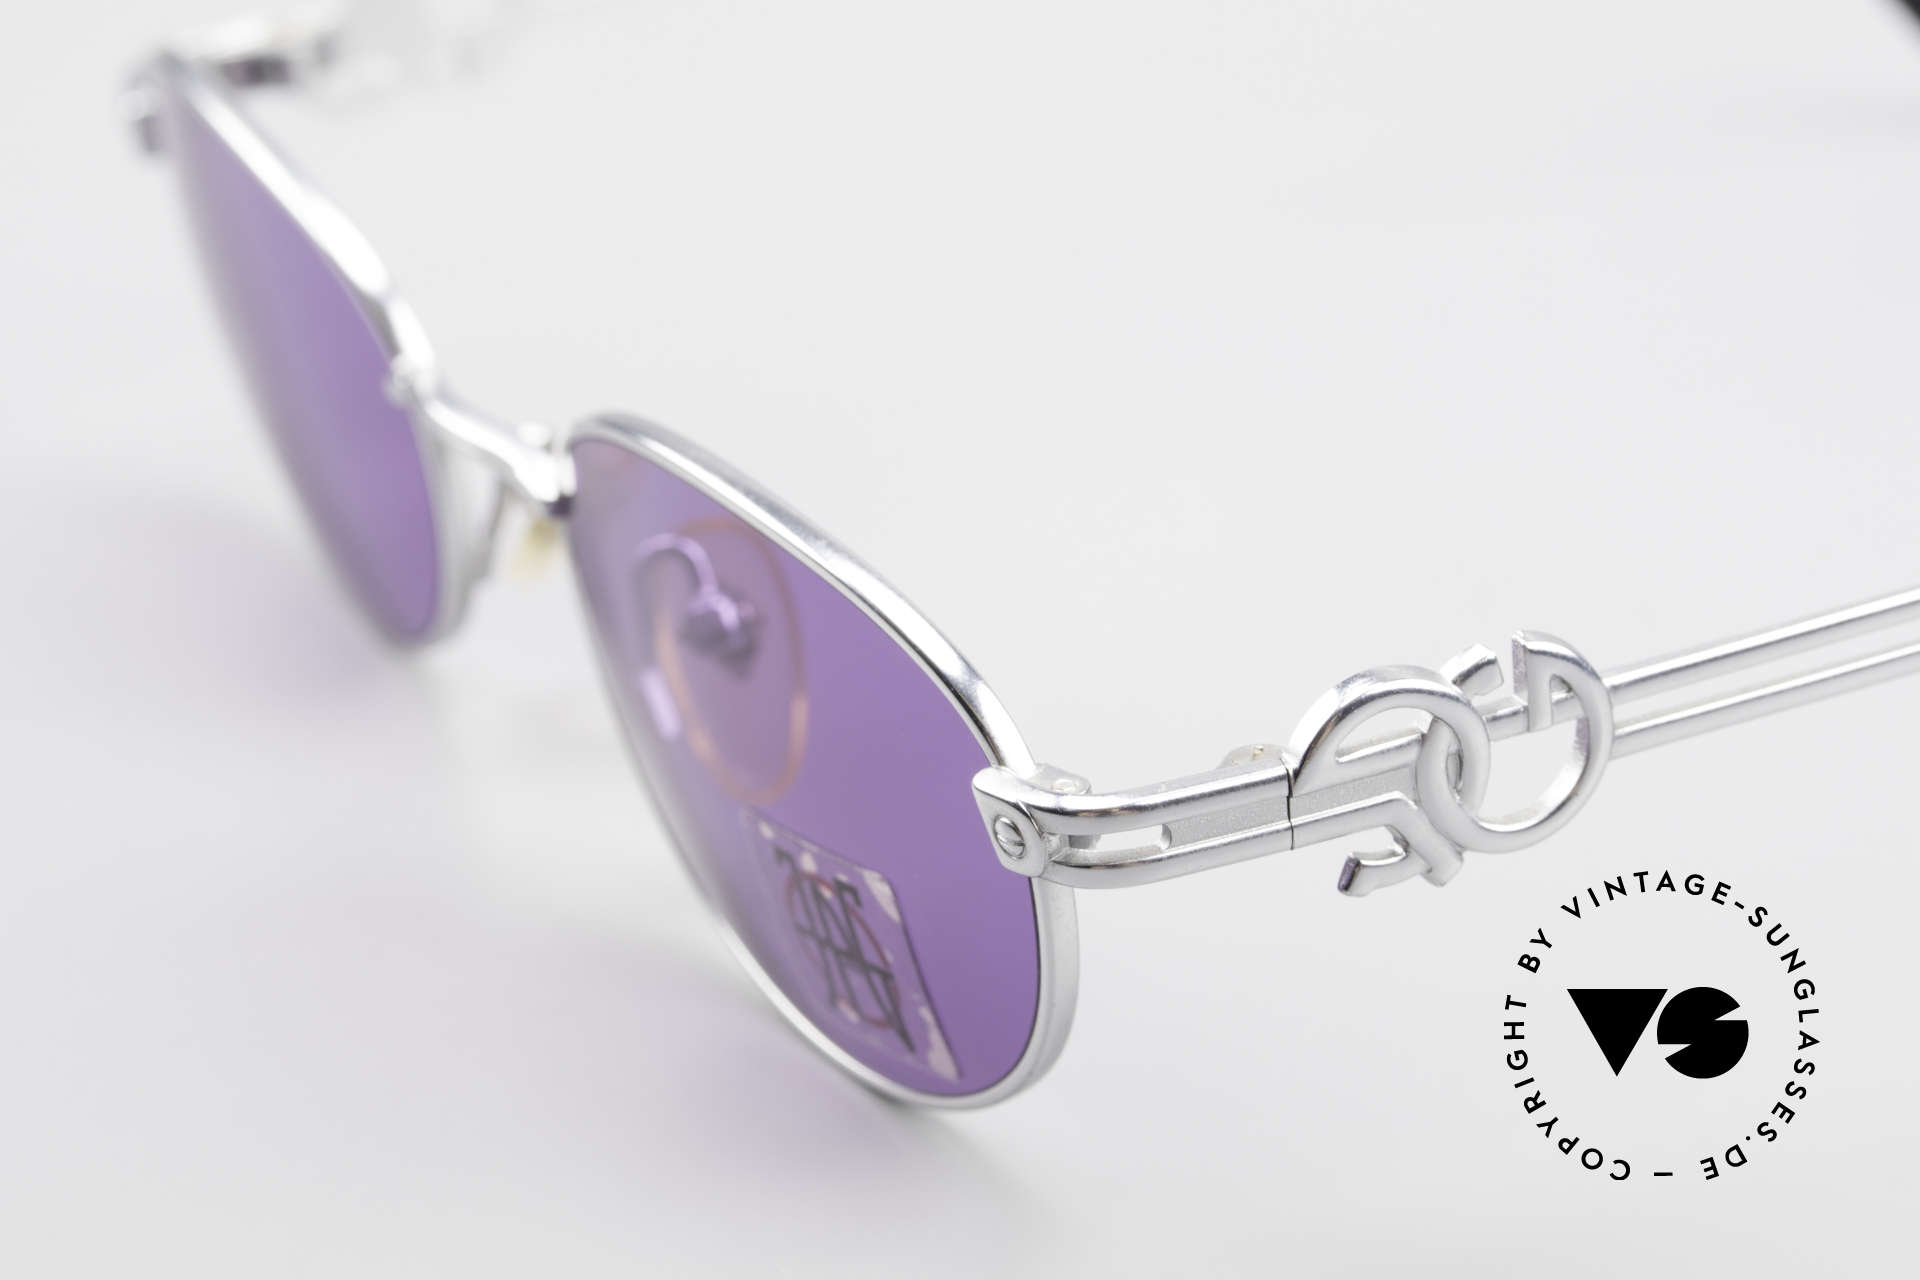 Jean Paul Gaultier 57-5101 Oval JPG Vintage Sunglasses, unused (like all our Jean P. Gaultier sunglasses), Made for Men and Women